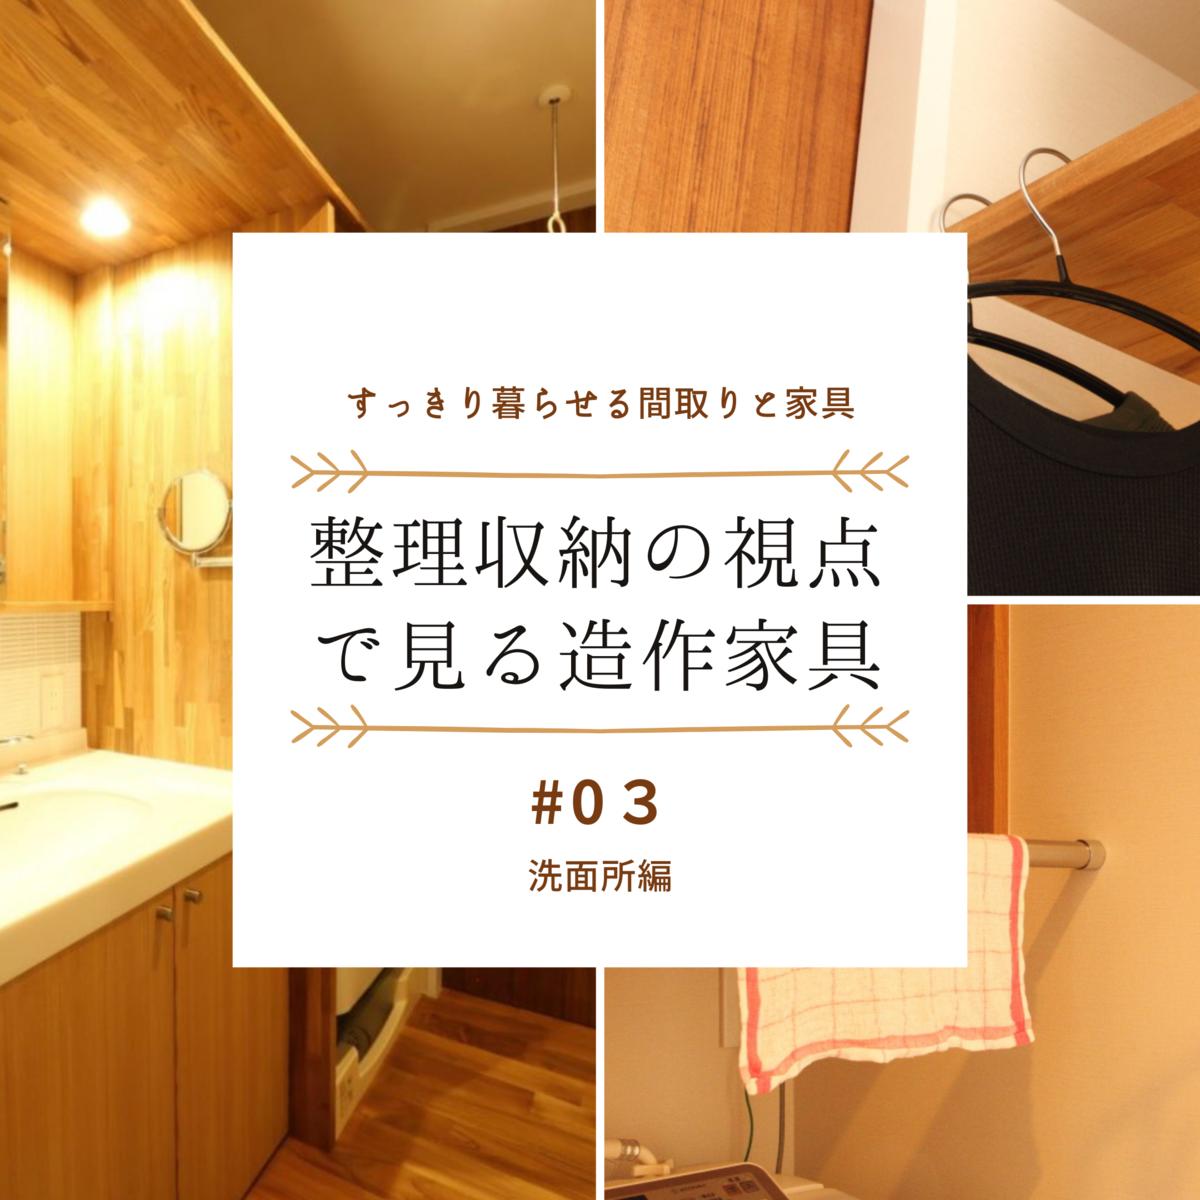 f:id:yusei2000:20201010212008p:plain